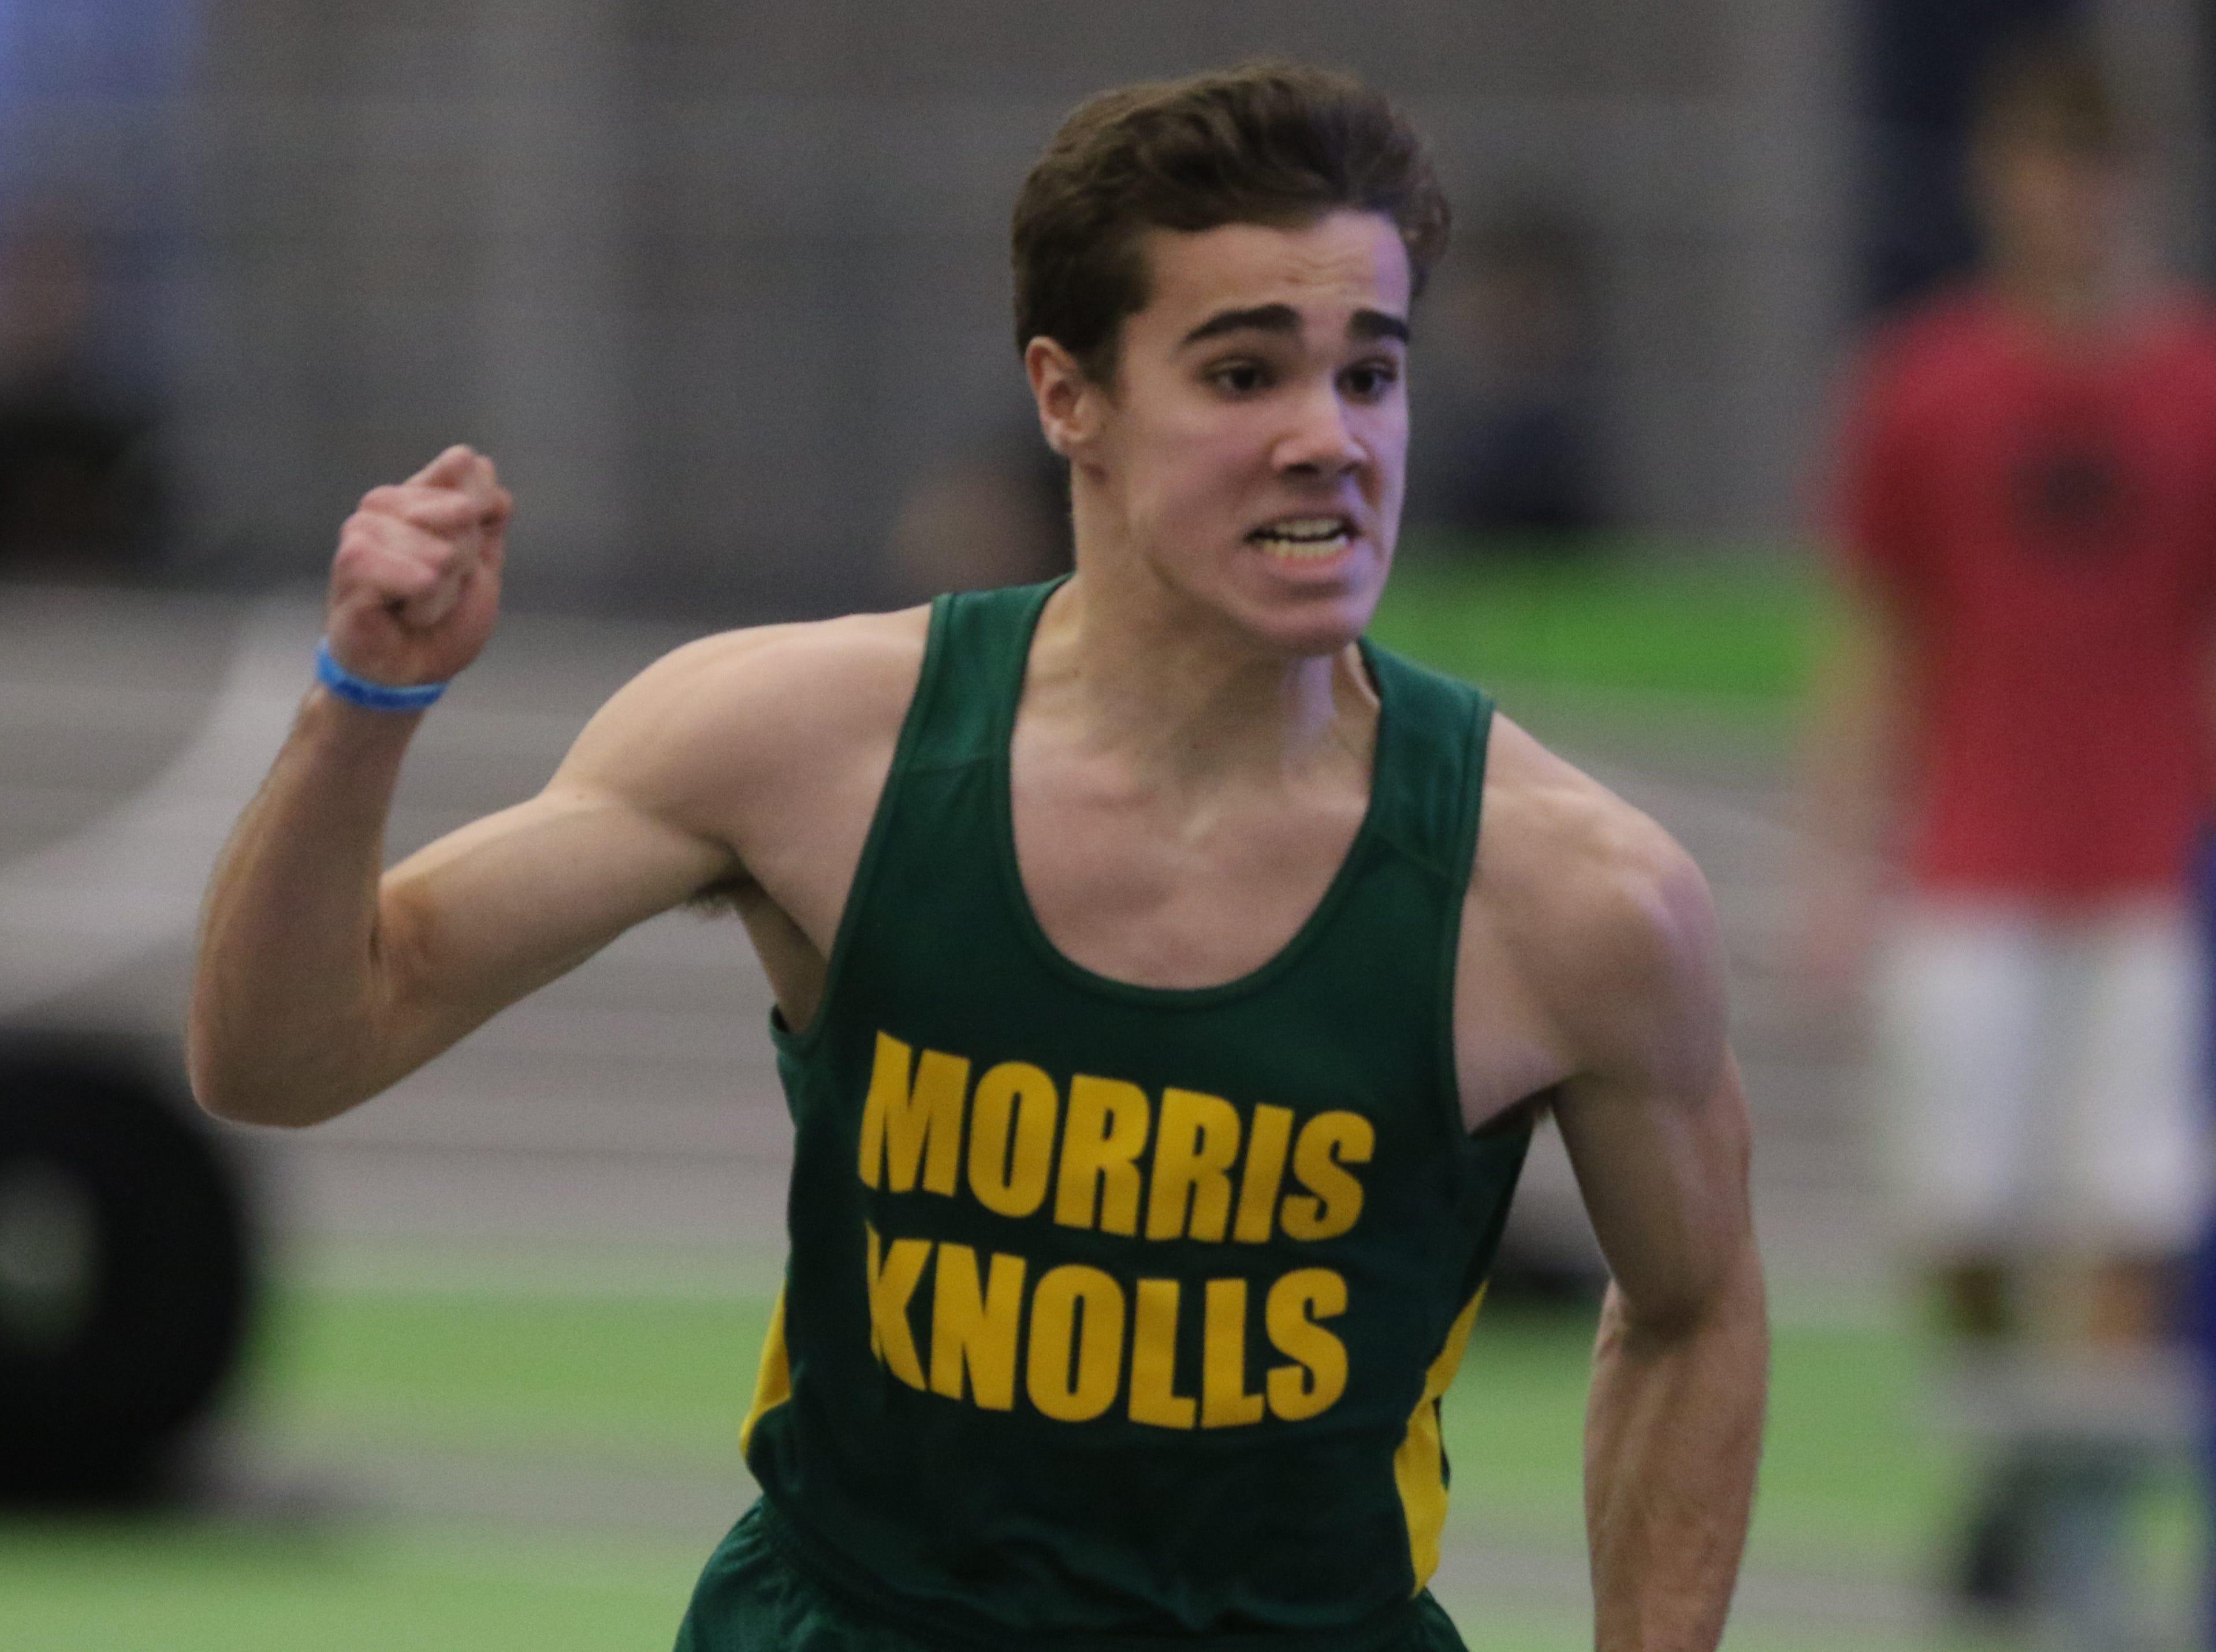 Raul Esteves of Morris Knolls after he wins the boys 55 meter dash.